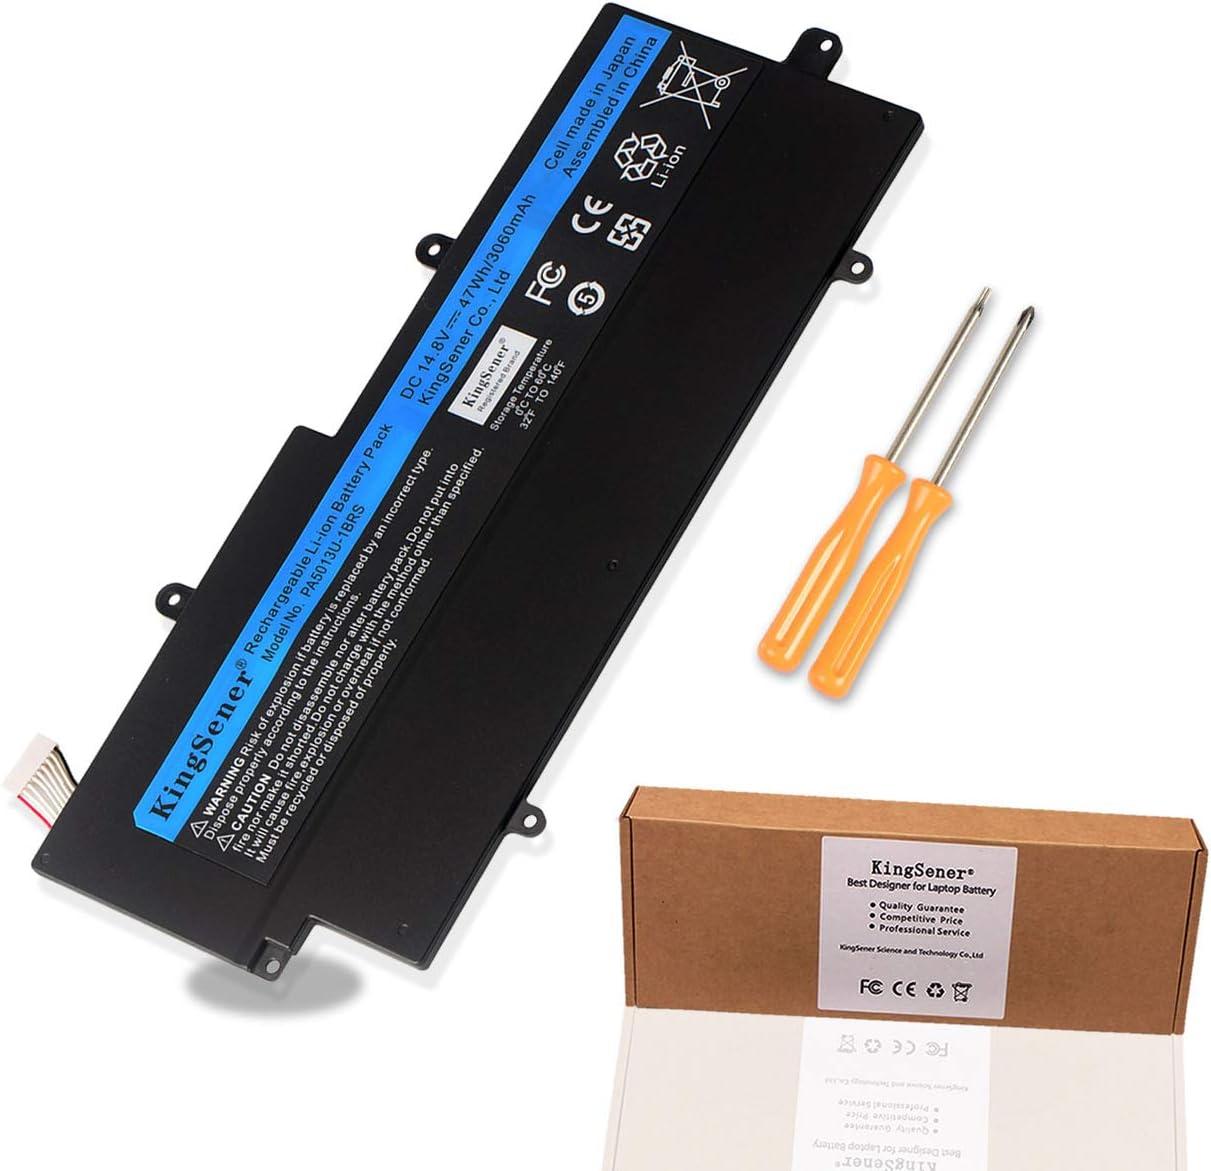 KingSener PA5013U-1BRS PA5013U Batería para portátil Toshiba Portege Z835 Z830 Z930 Z935 Ultrabook PA5013 14.8V 3060mAh